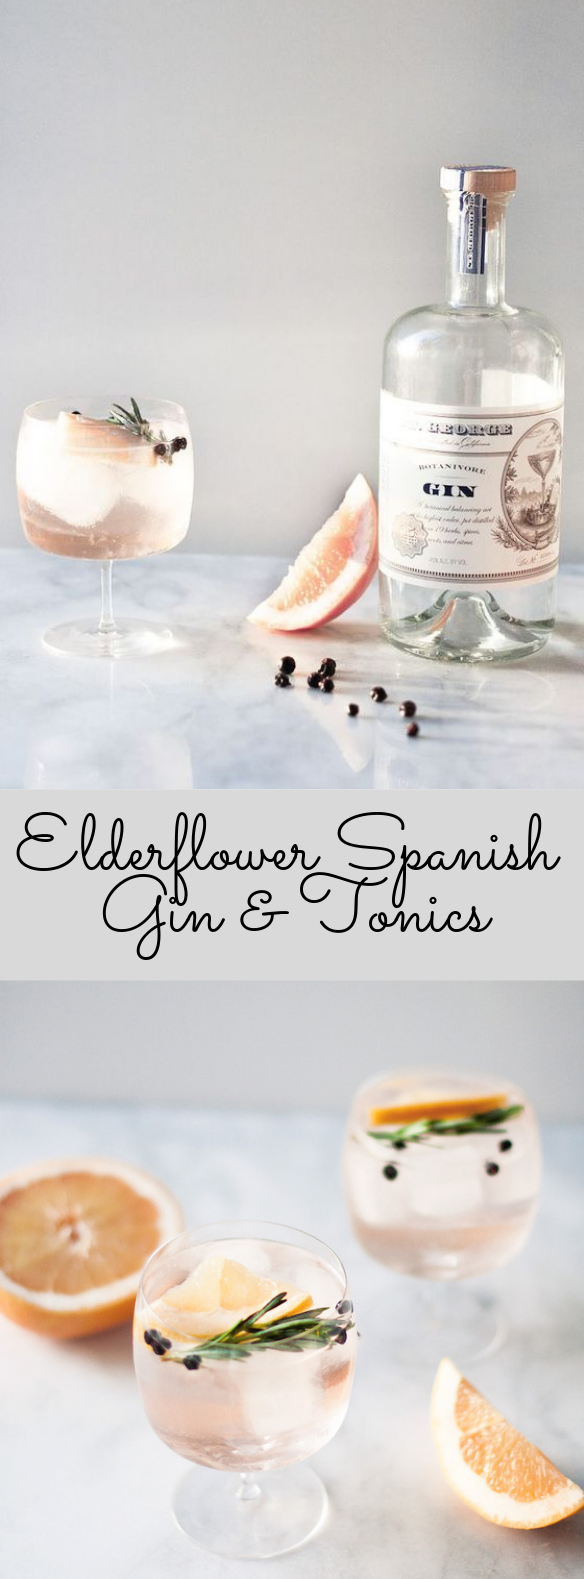 Elderflower Spanish Gin & Tonics #Cocktail #ValentinDay